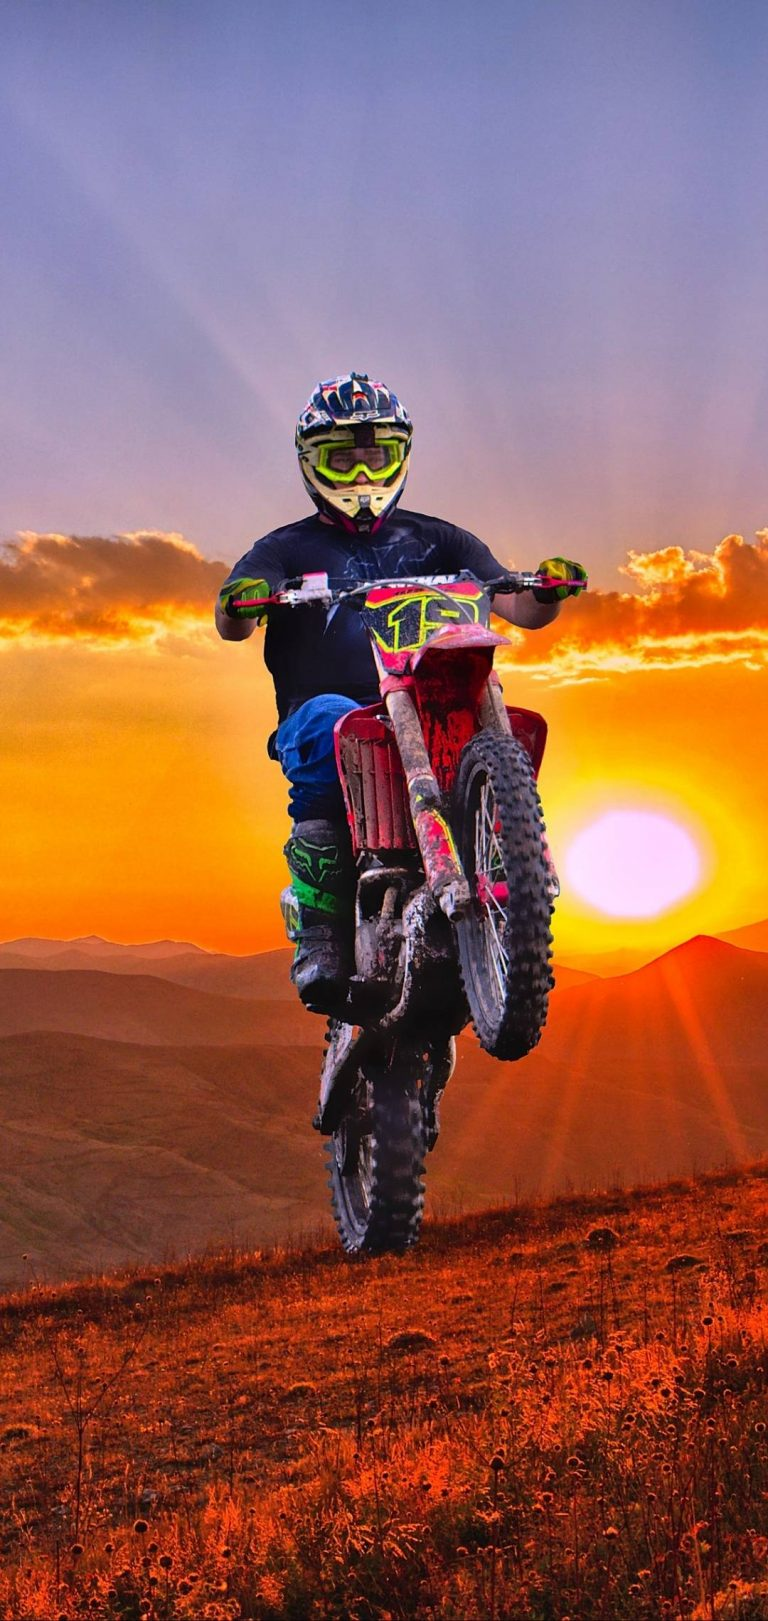 Sports Bike Jump Wallpaper Lock Screen Dirt Bike 768x1621 Download Hd Wallpaper Wallpapertip